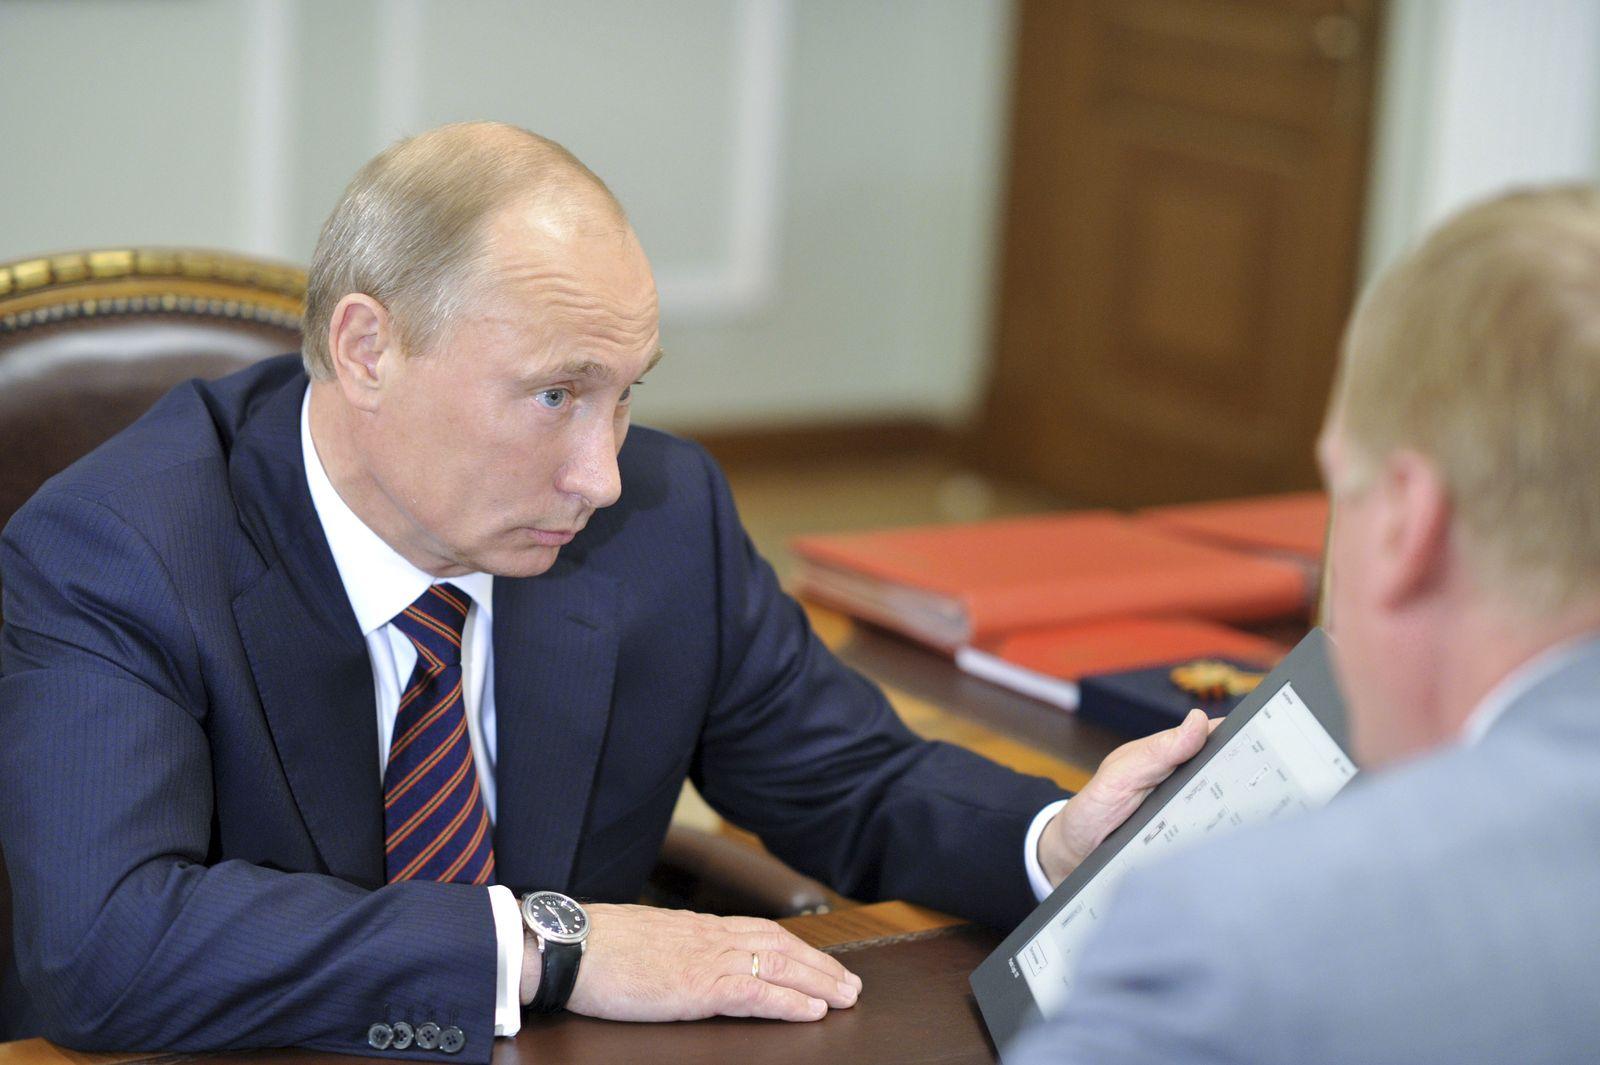 Putin mit Tablet/ iPad